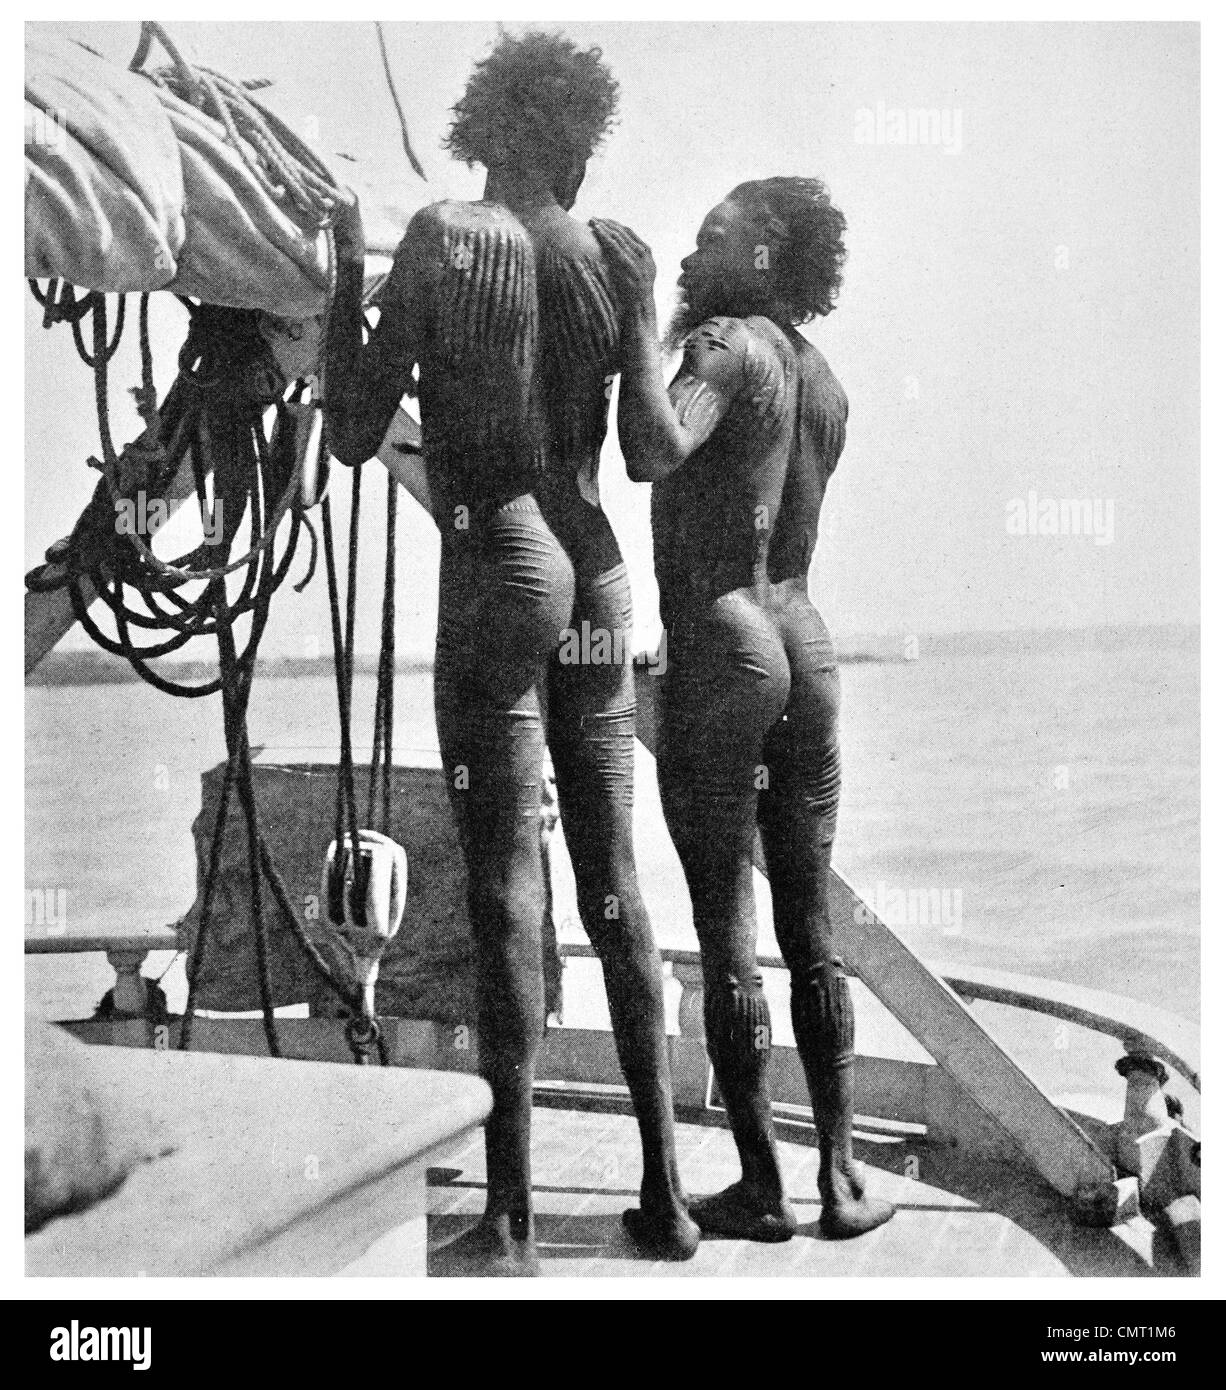 1924 Aboriginal Body Art Tattoo western Australia - Stock Image